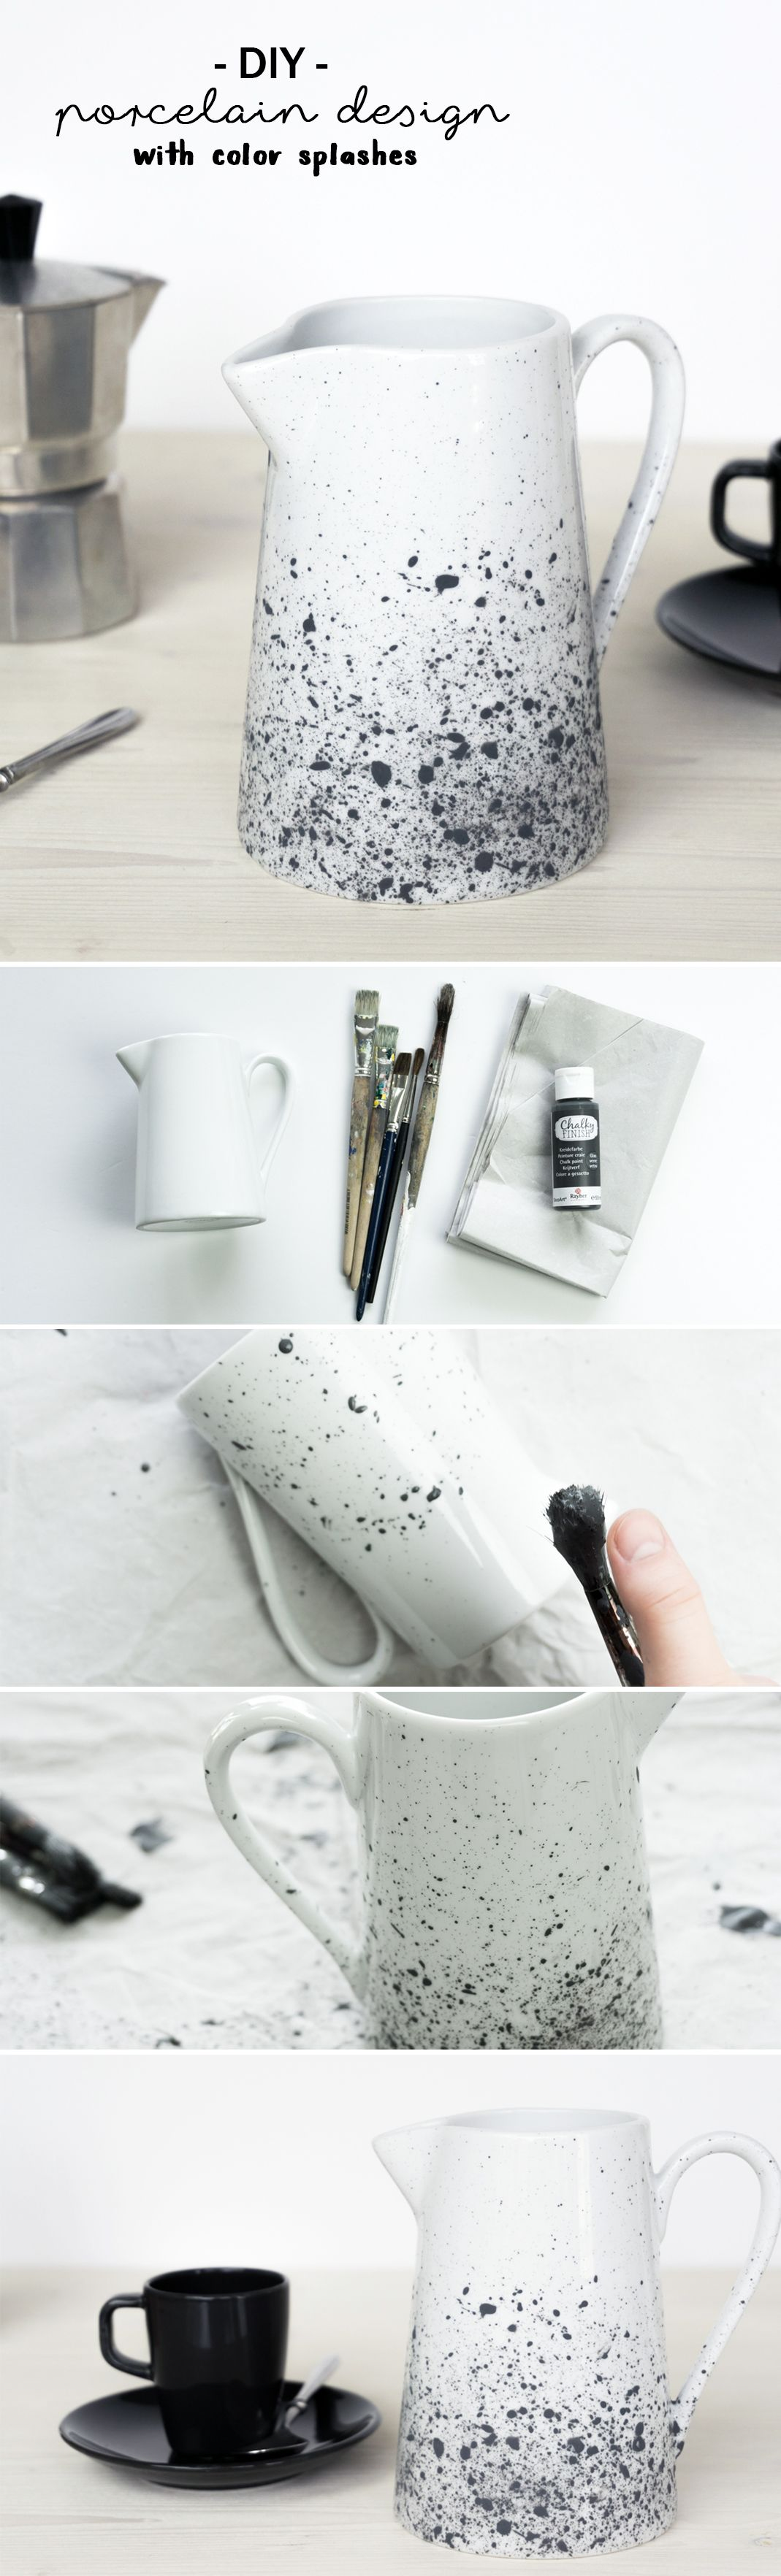 diy porzellan bemalen kanne mit sprenkelmuster craft diys and diy ideas. Black Bedroom Furniture Sets. Home Design Ideas